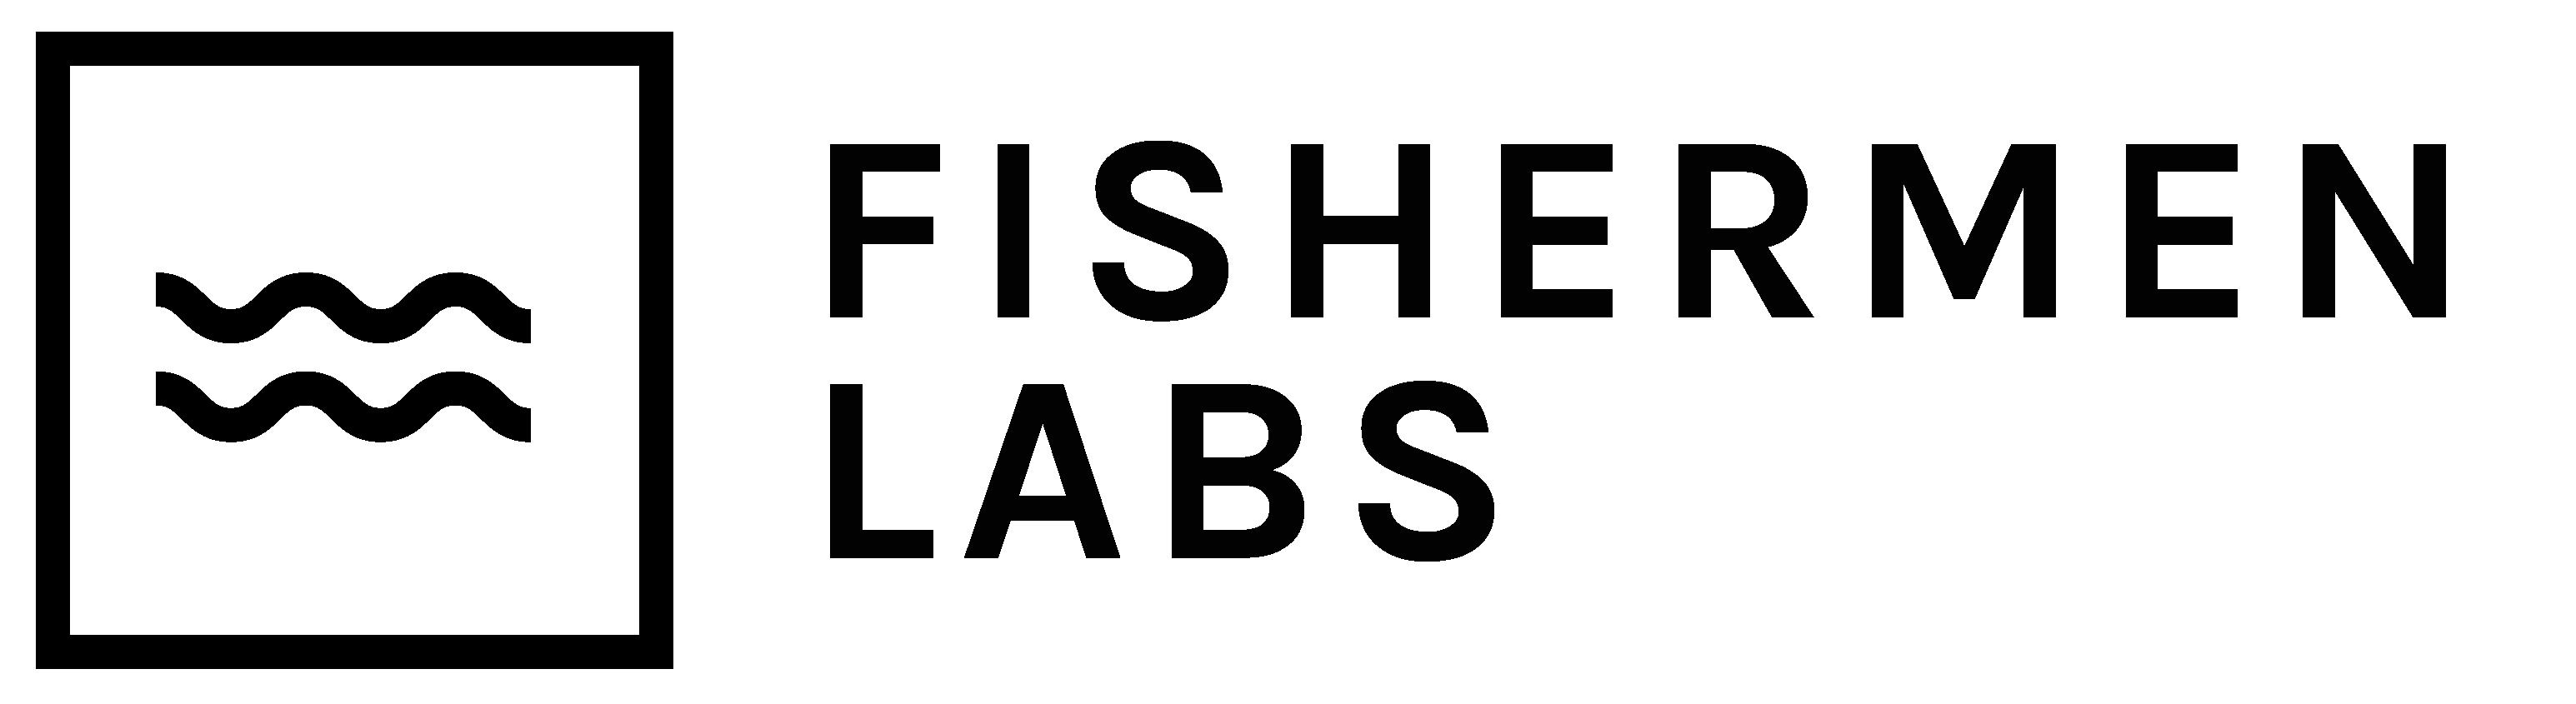 search visual arts all countries gamasutra jobs fishermen labs s logo